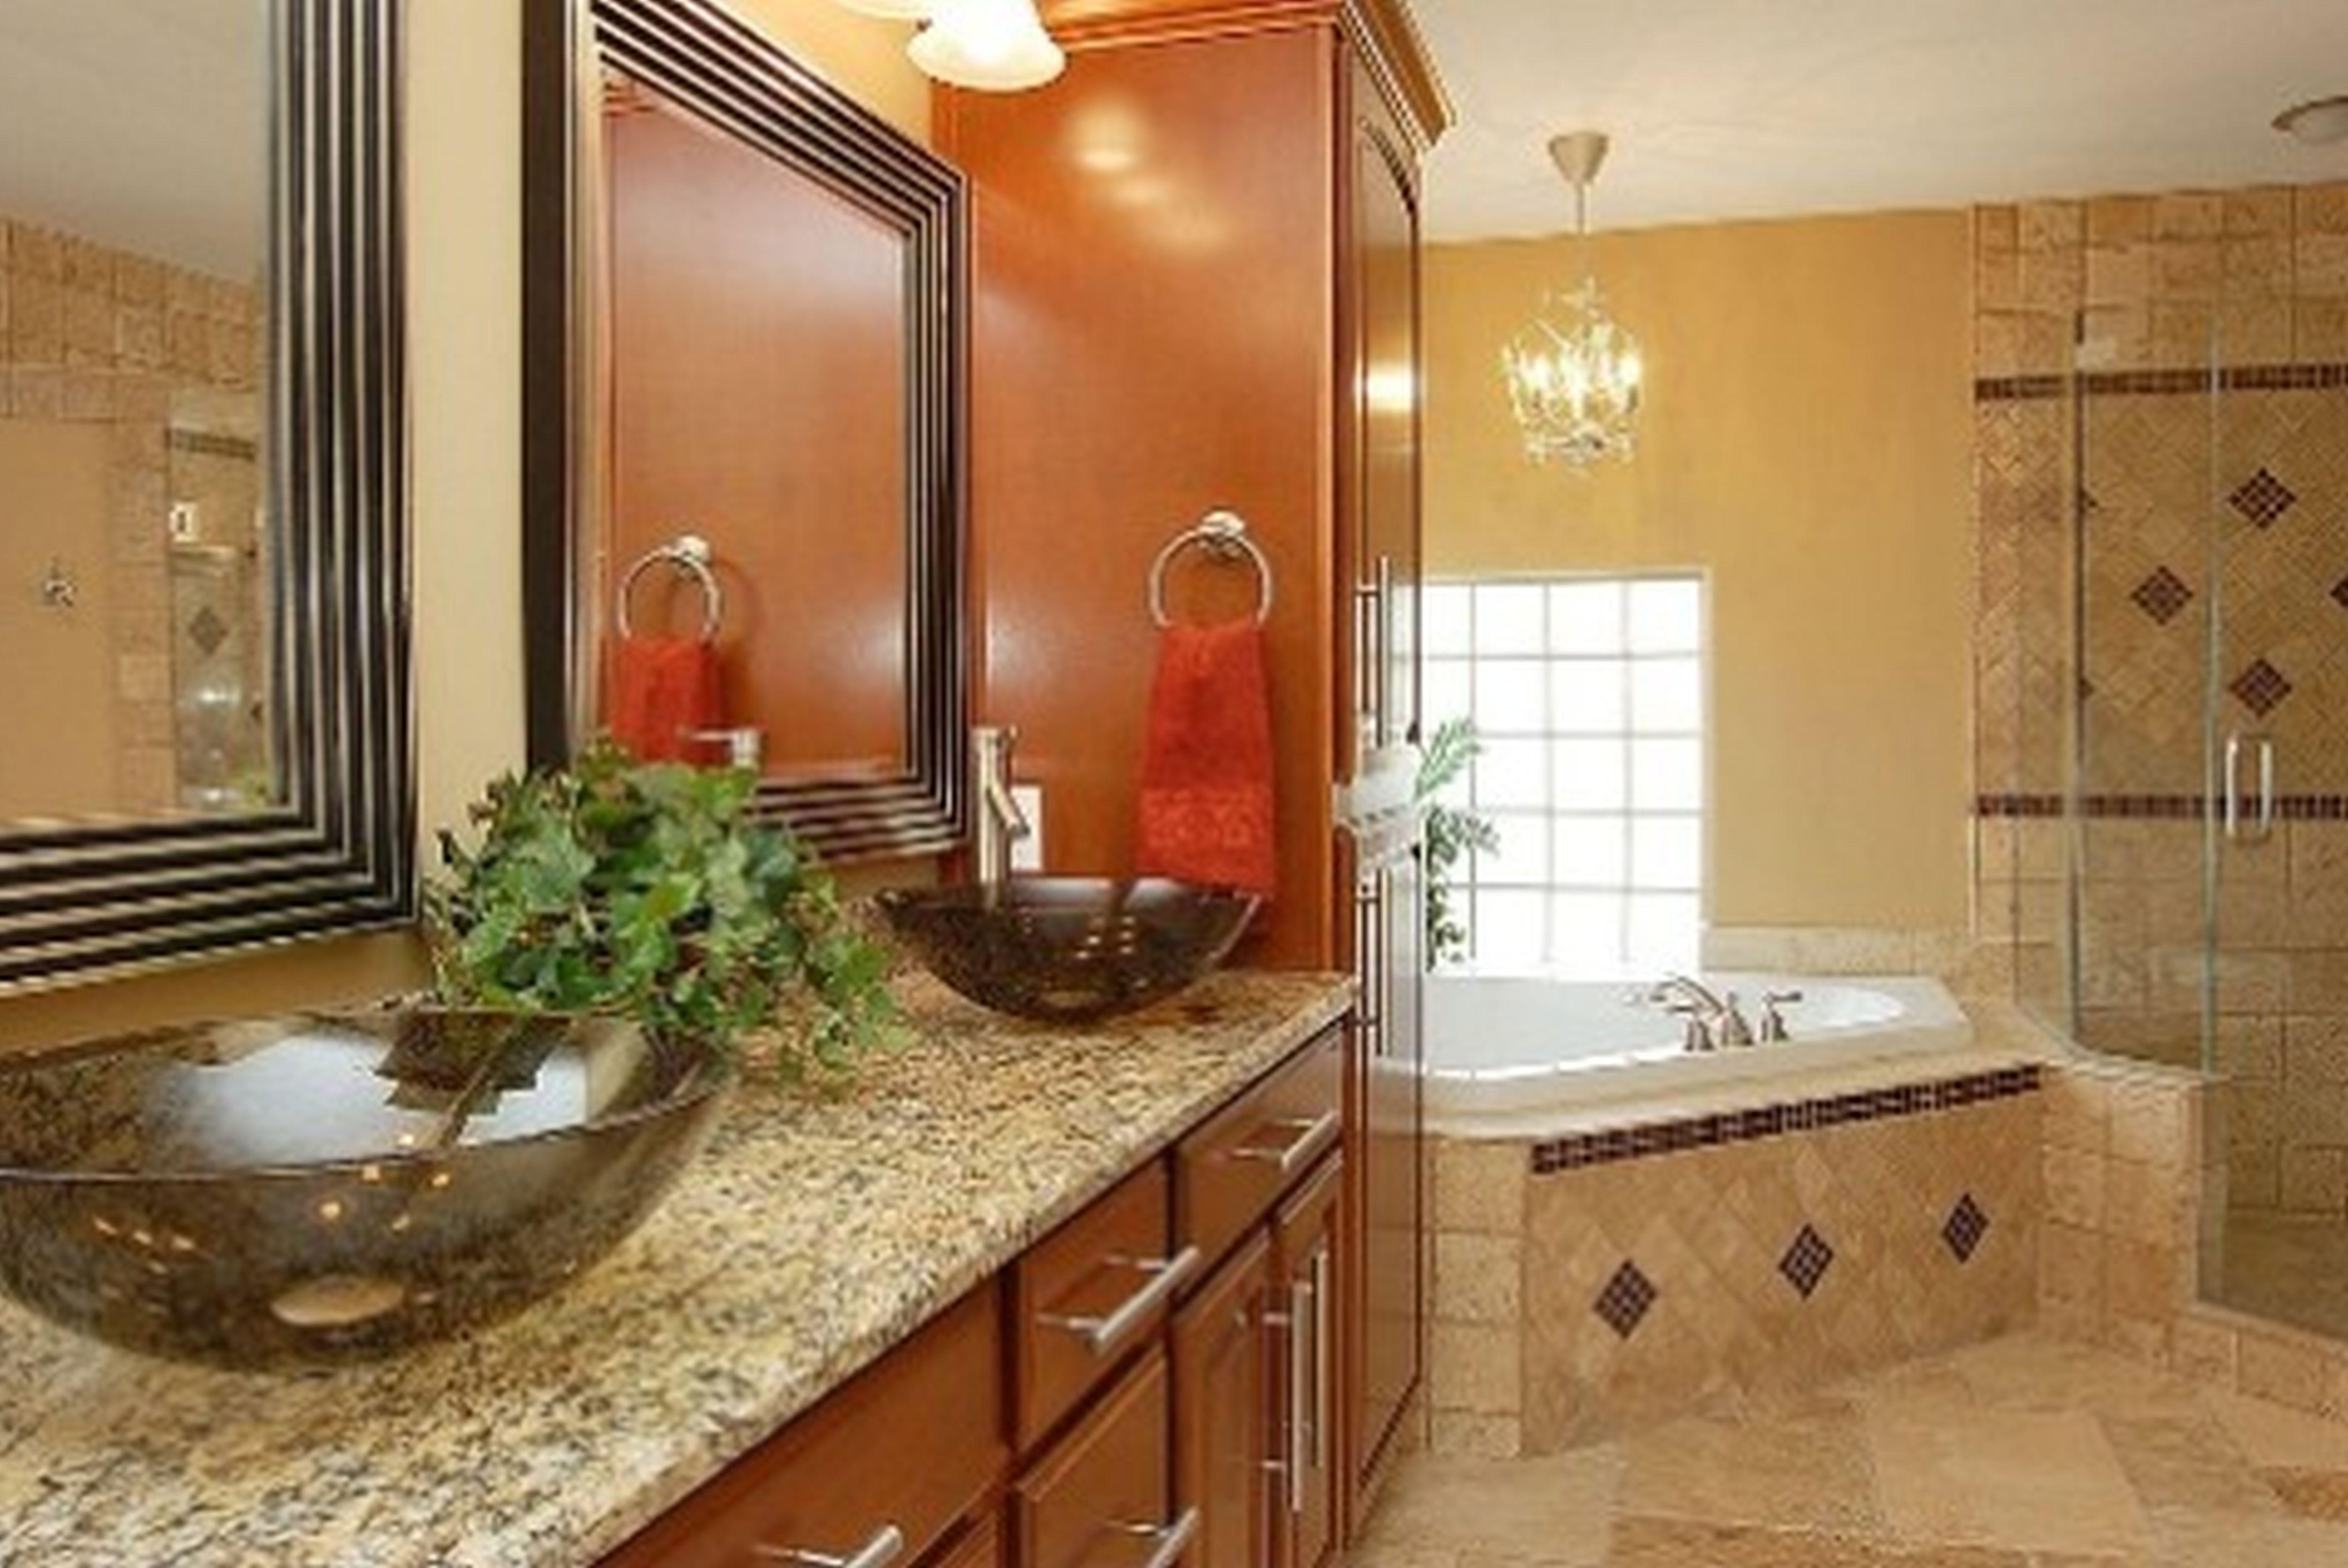 Best Bathtub Accessories • Bathtub Ideas